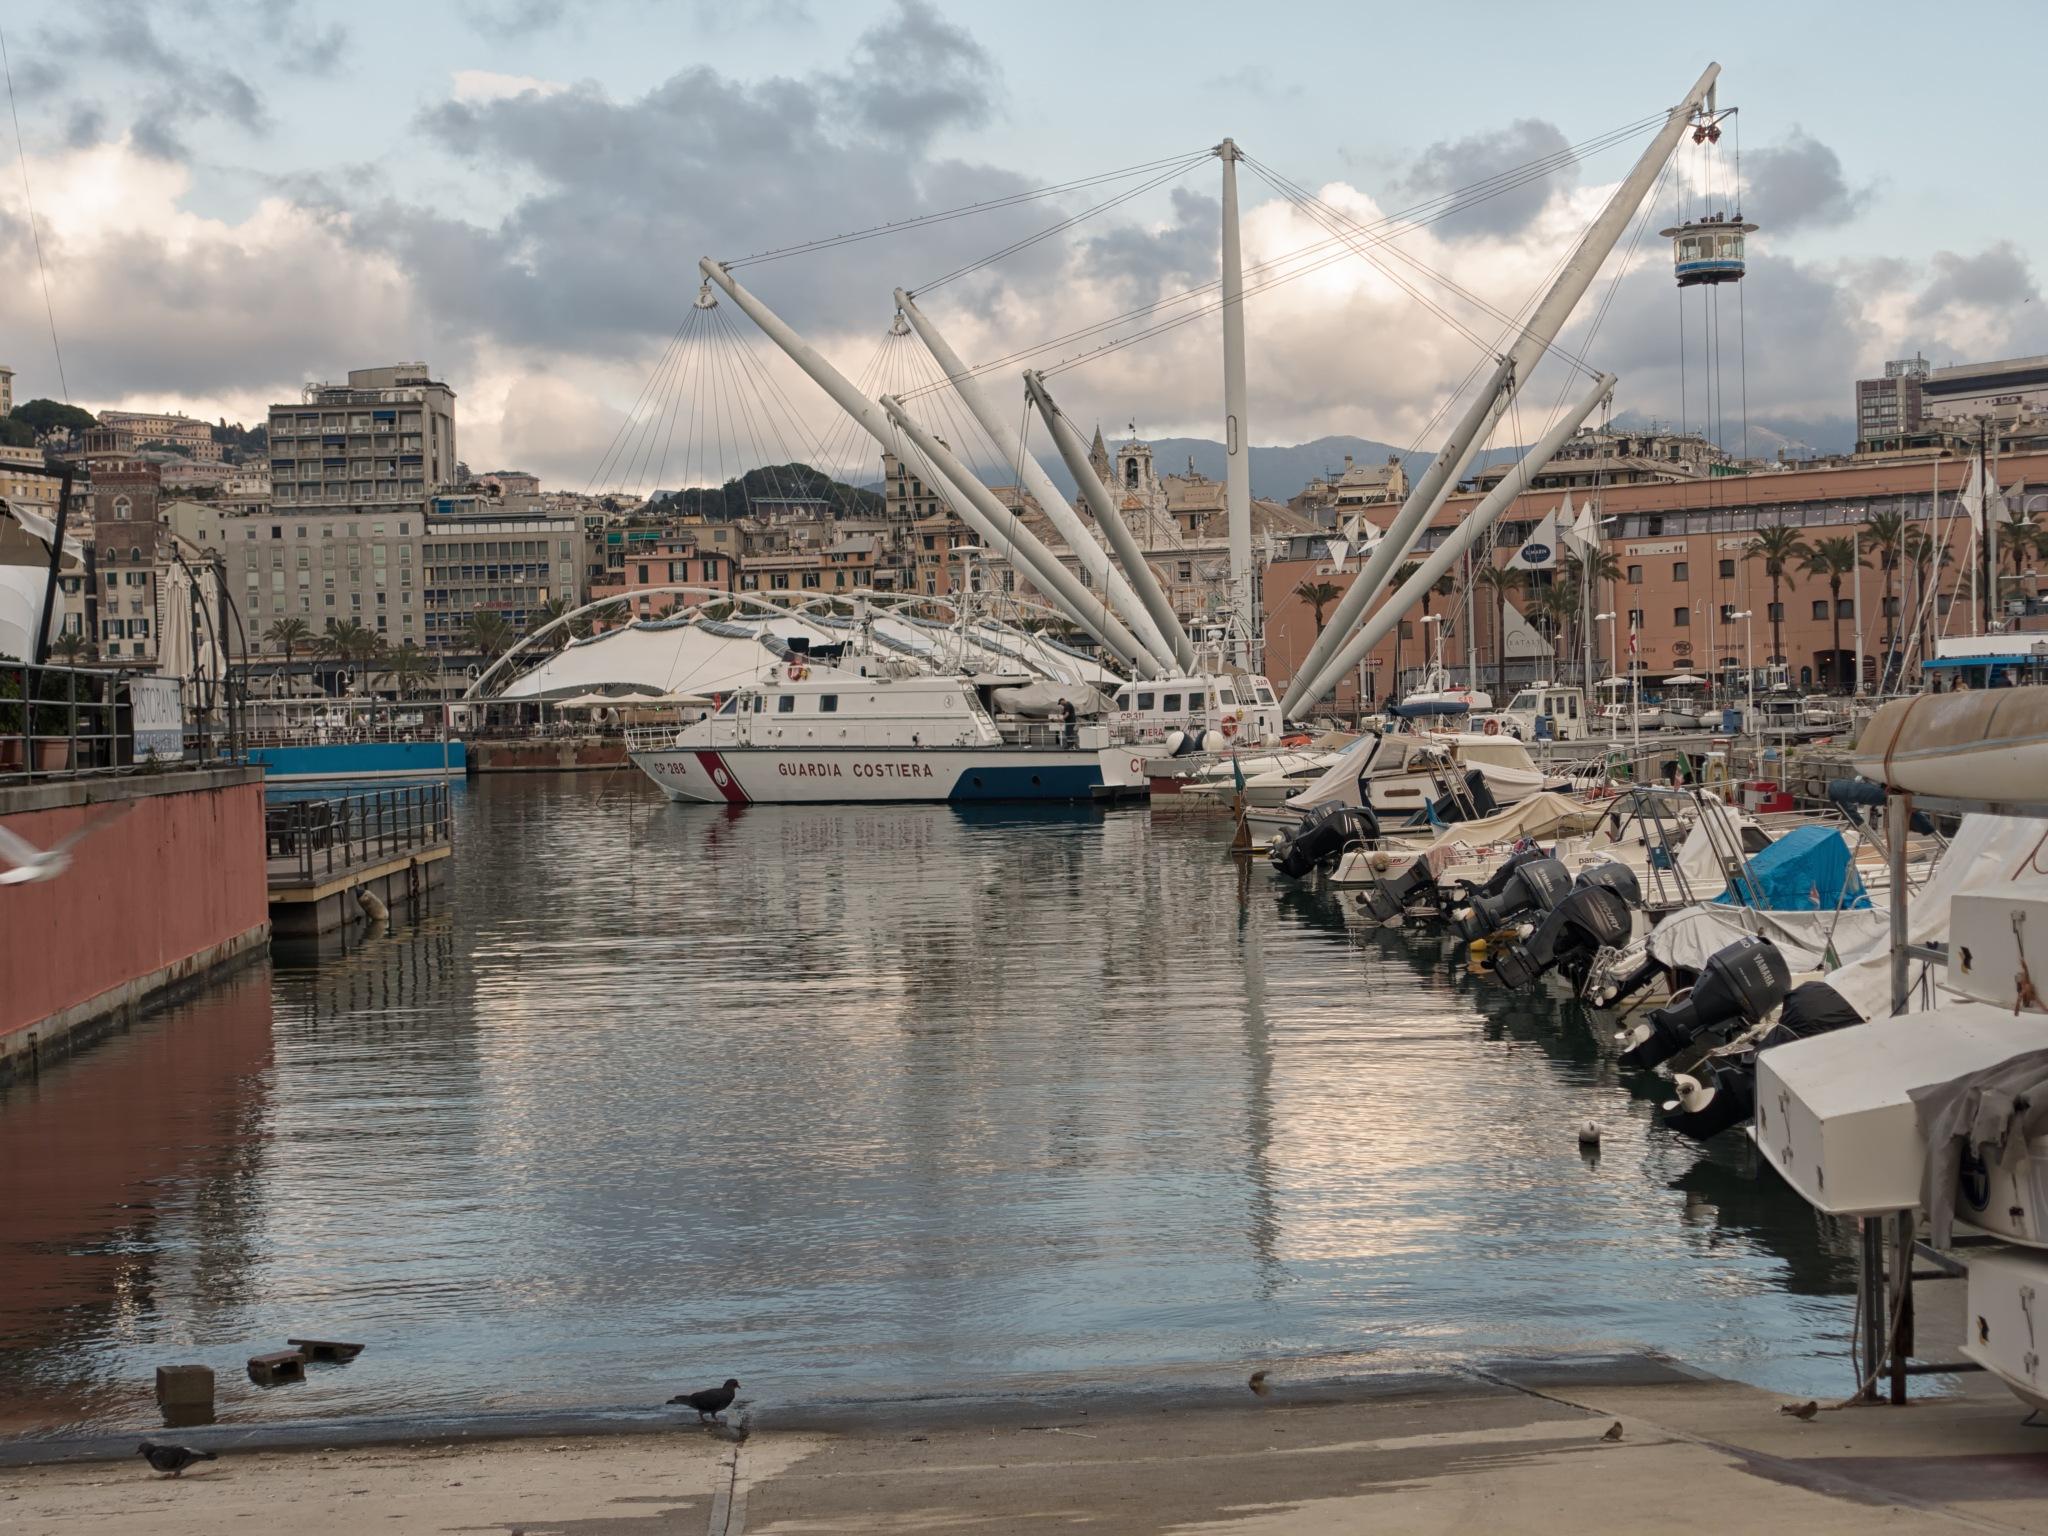 Genoa ancient harbour by sunrisesunset